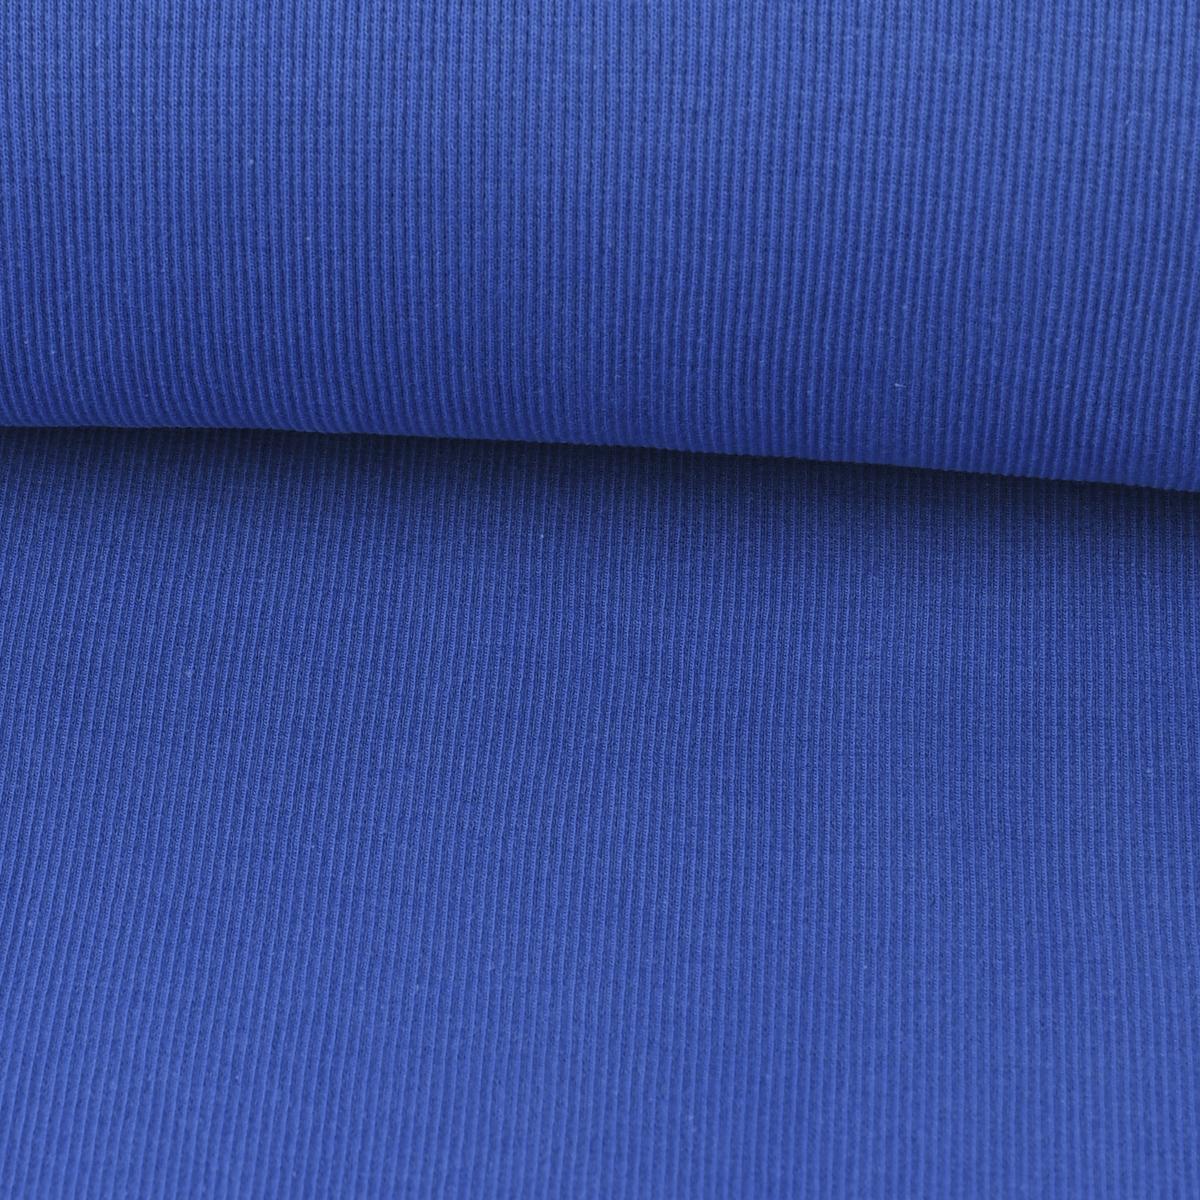 Kreativstoff Strickschlauch Bündchenstoff grob royalblau 27cm Breite